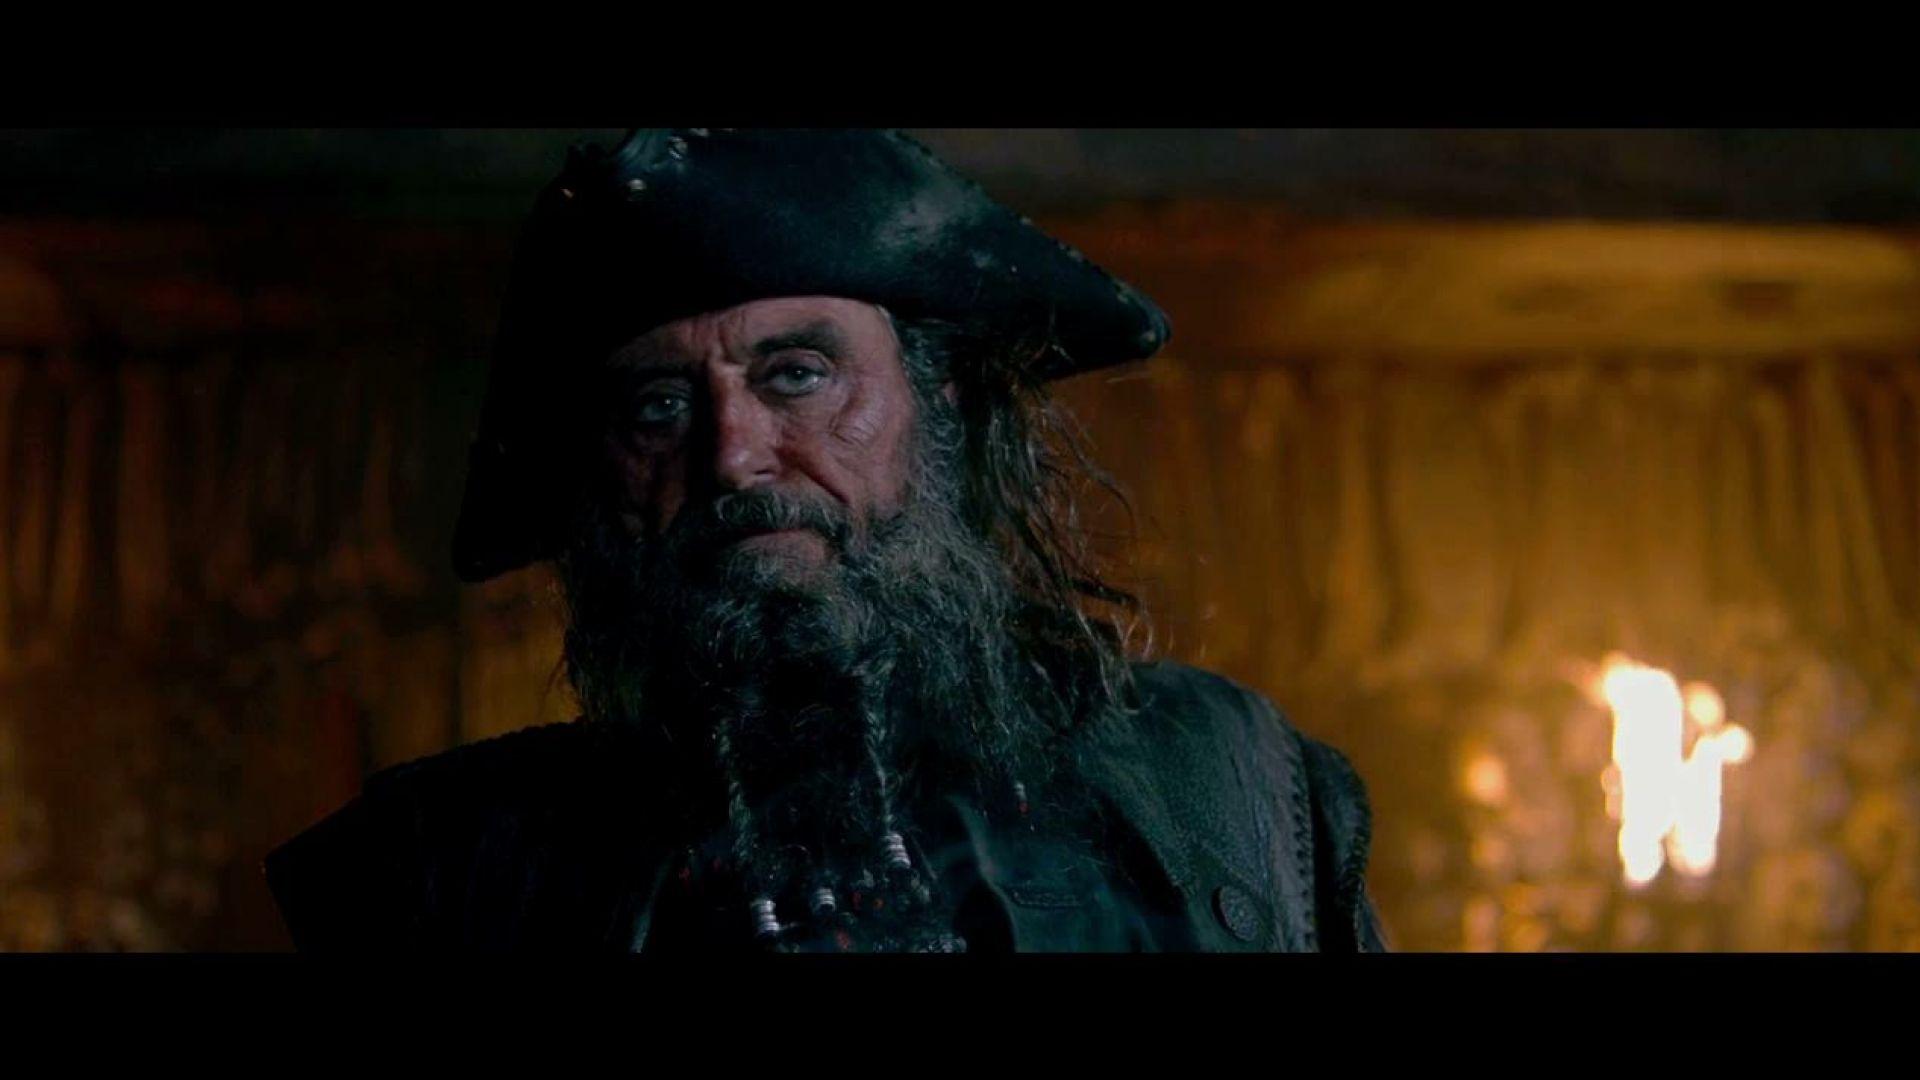 Blackbeard Wakes and Discovers Mutineers, Pirates 4